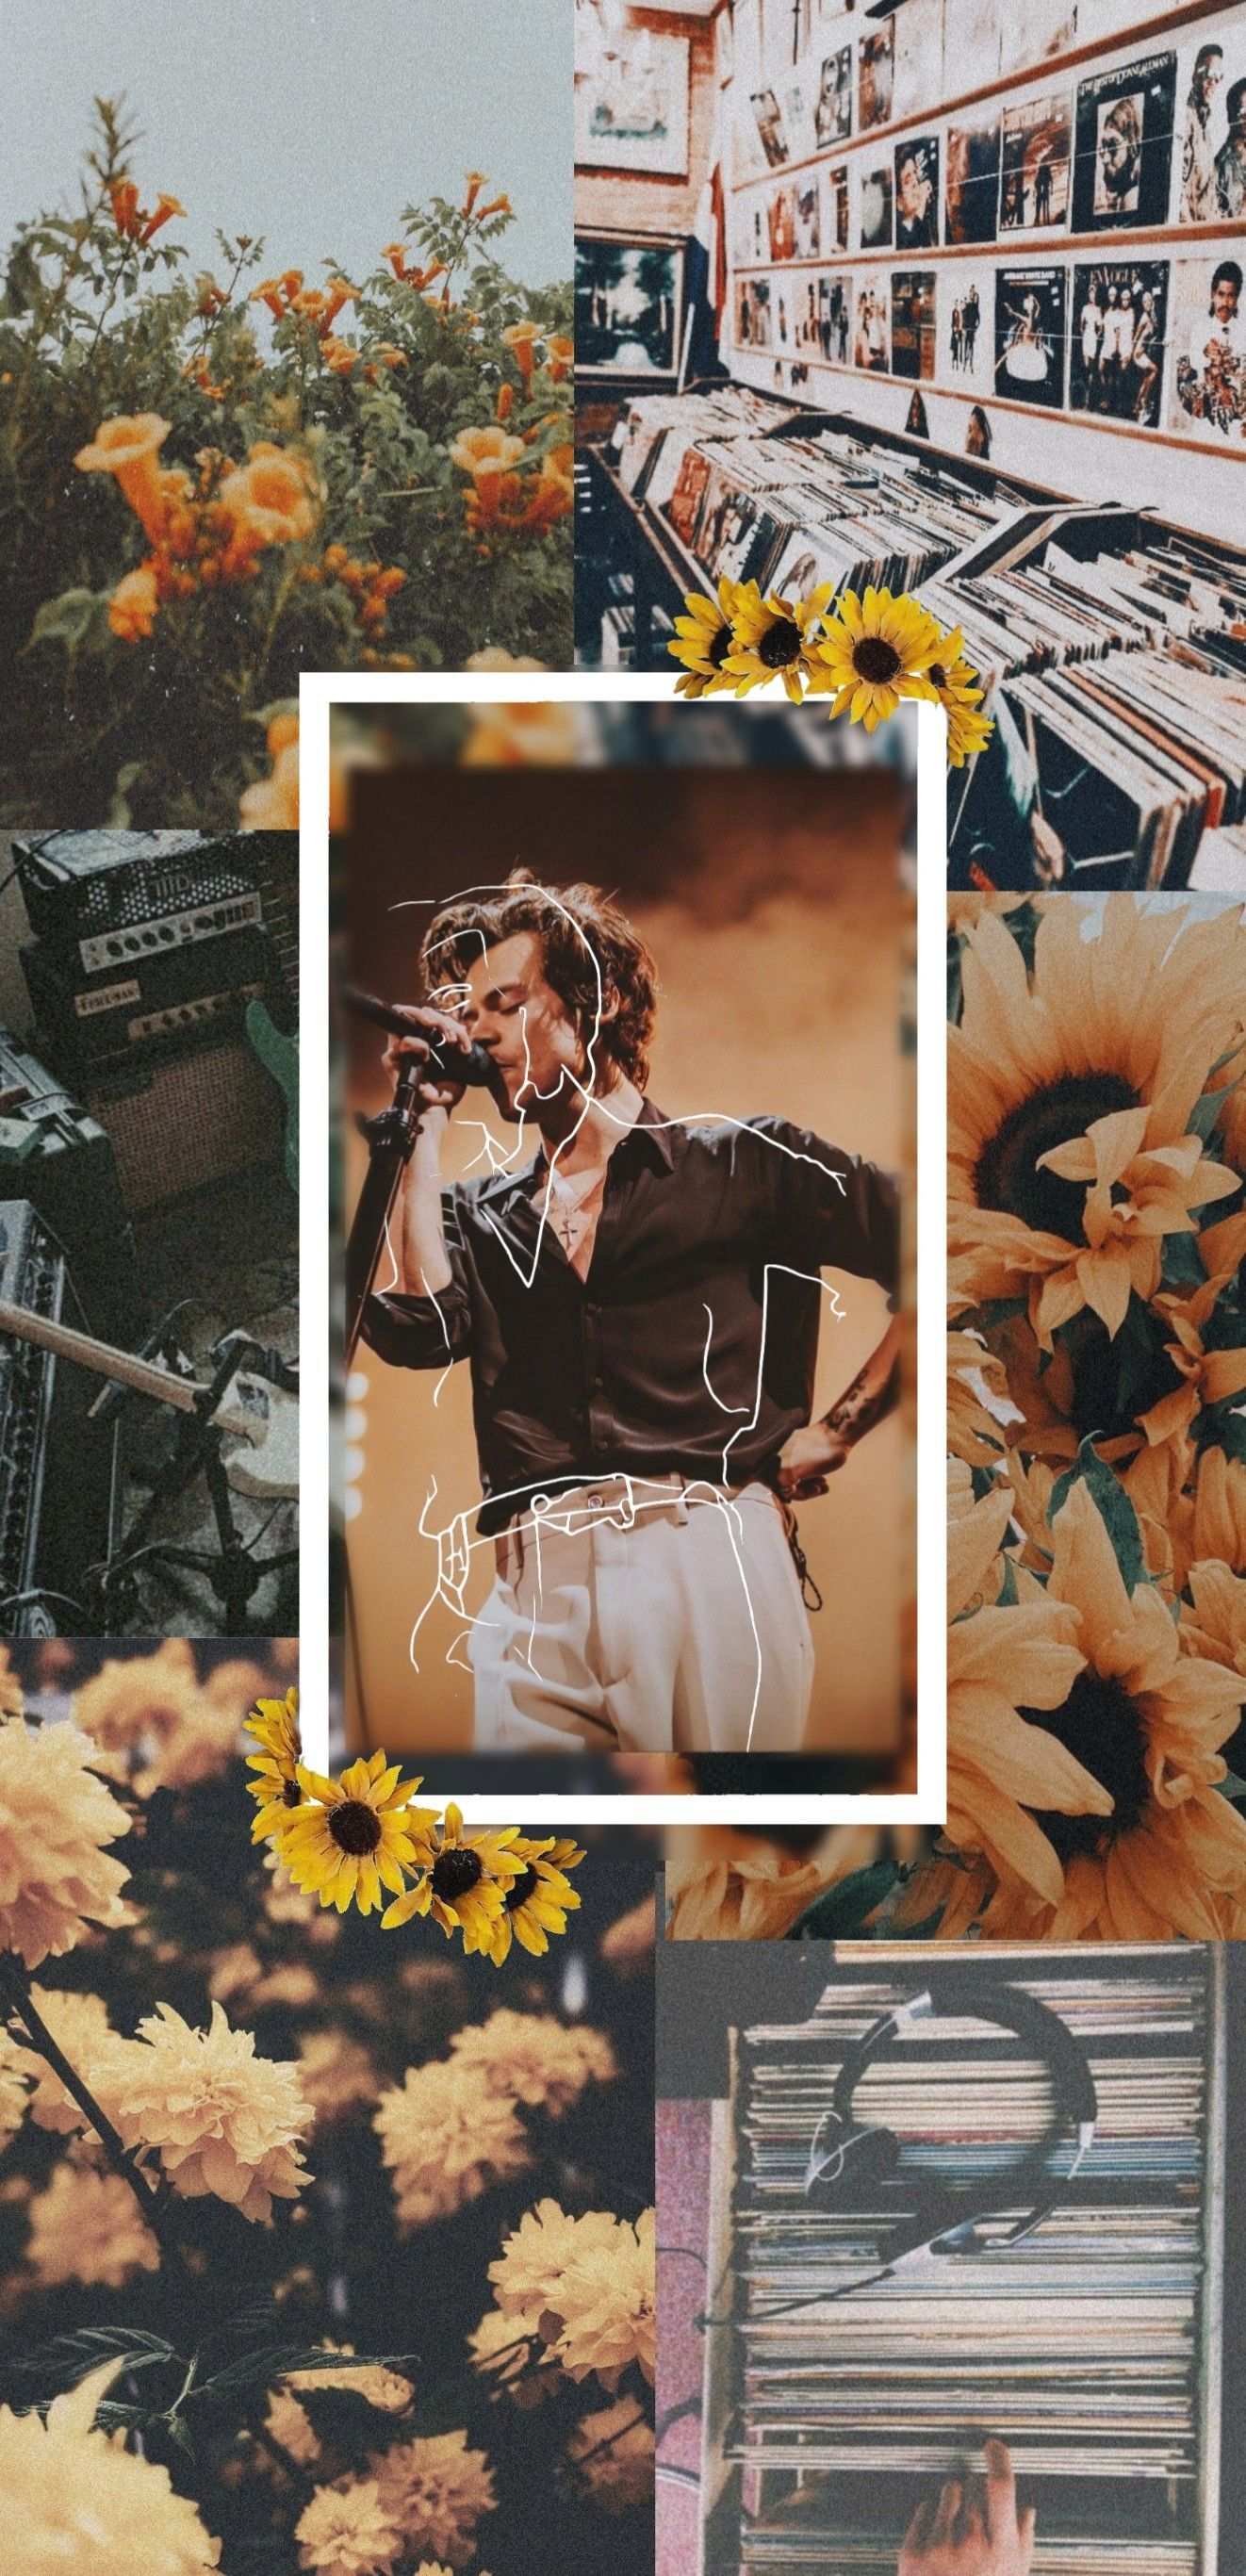 Harry Styles Wallpaper Harrystyles In 2020 Harry Styles Wallpaper Harry Styles Wallpaper Iphone Harry Styles Photos